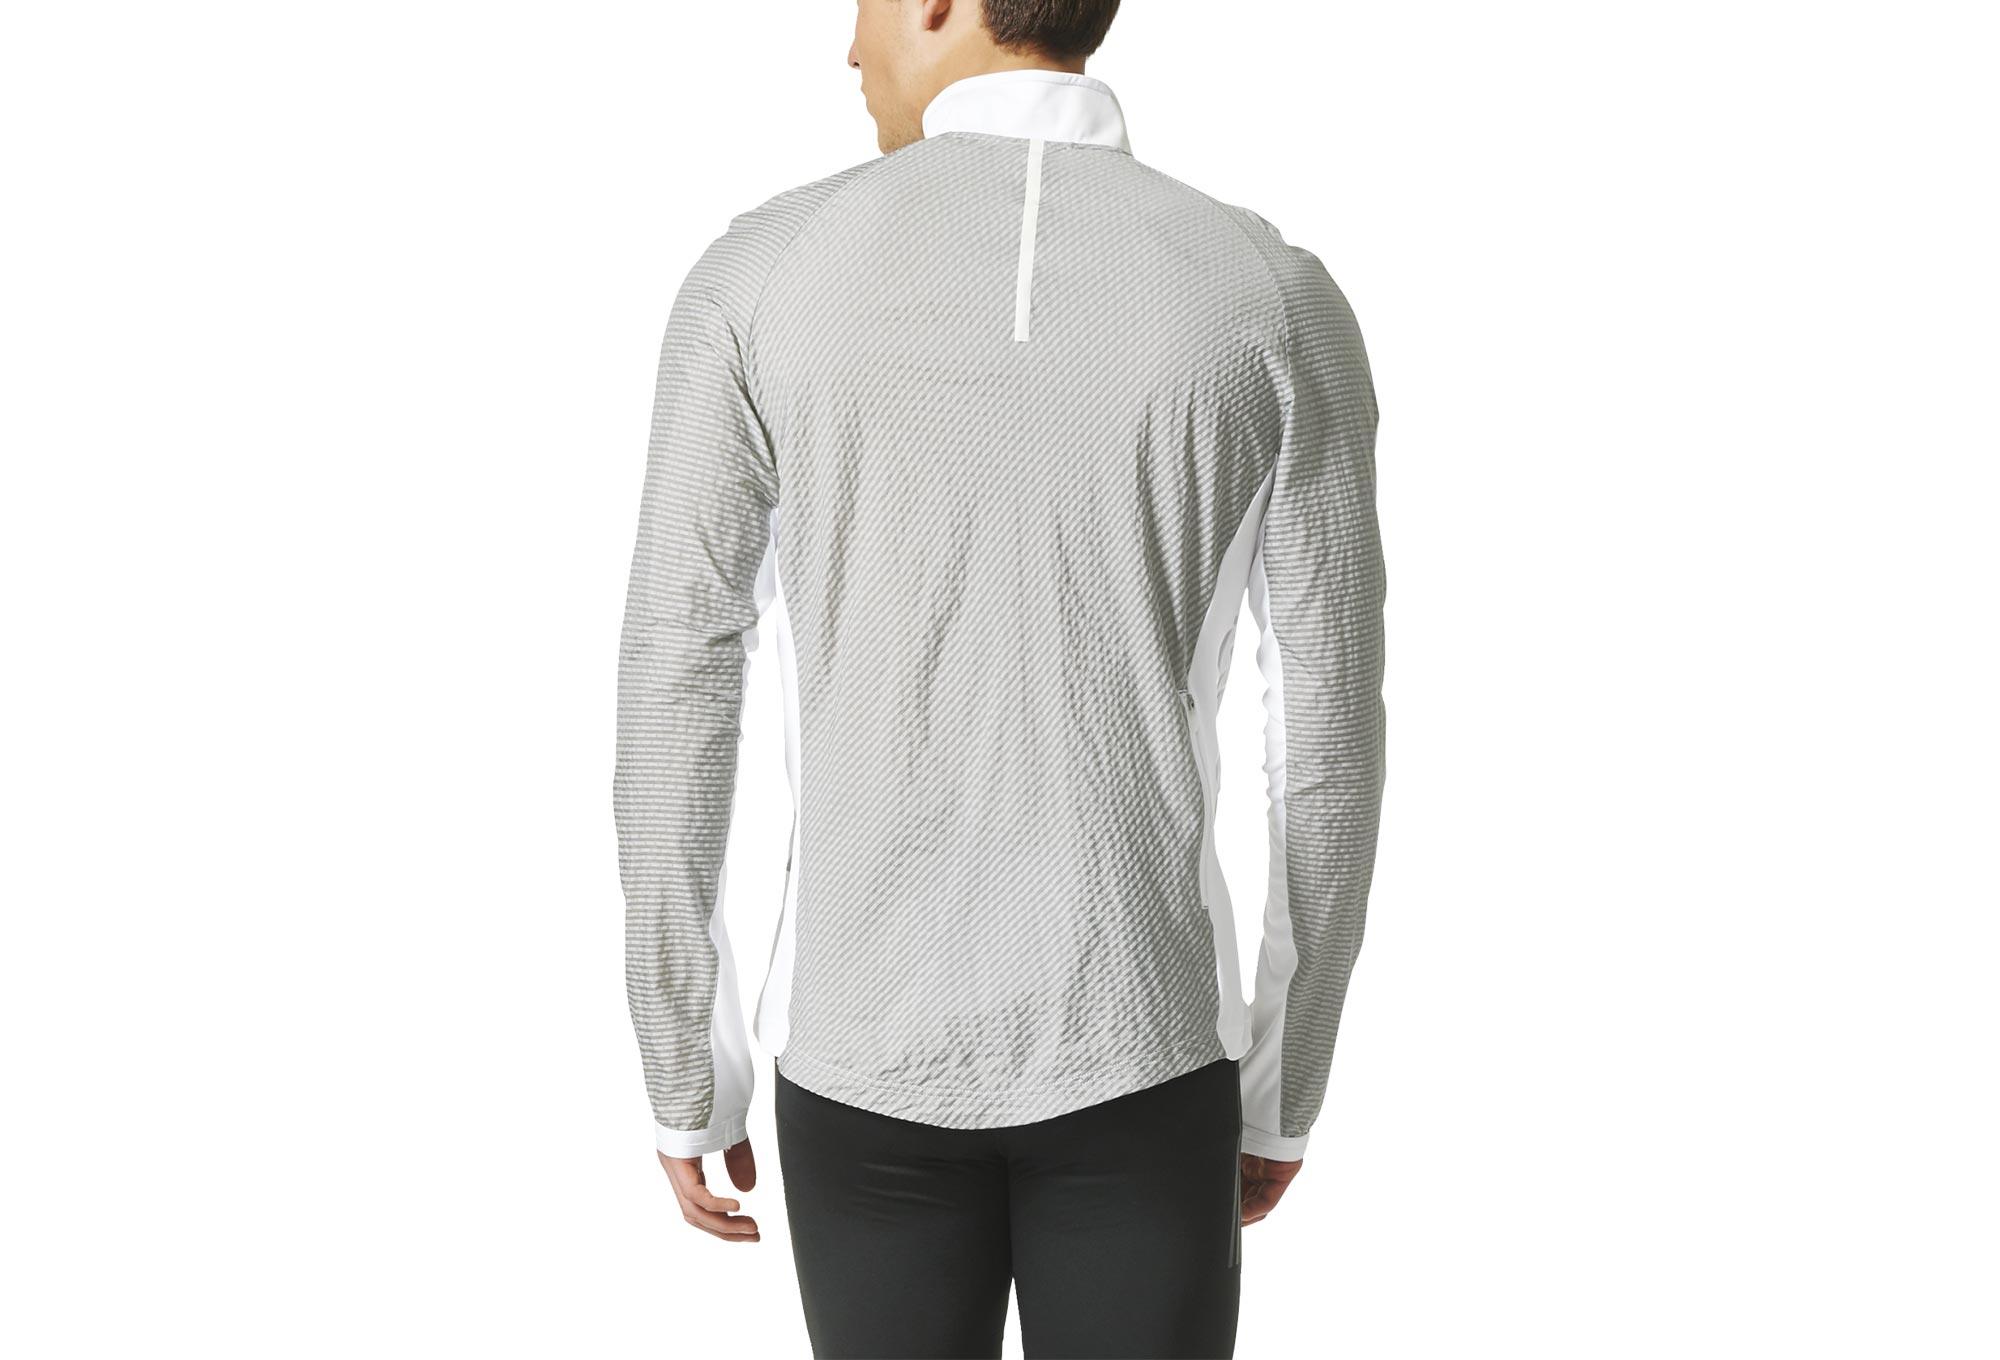 Veste coupe vent d perlant adidas running adizero blanc gris - Veste coupe vent adidas femme ...